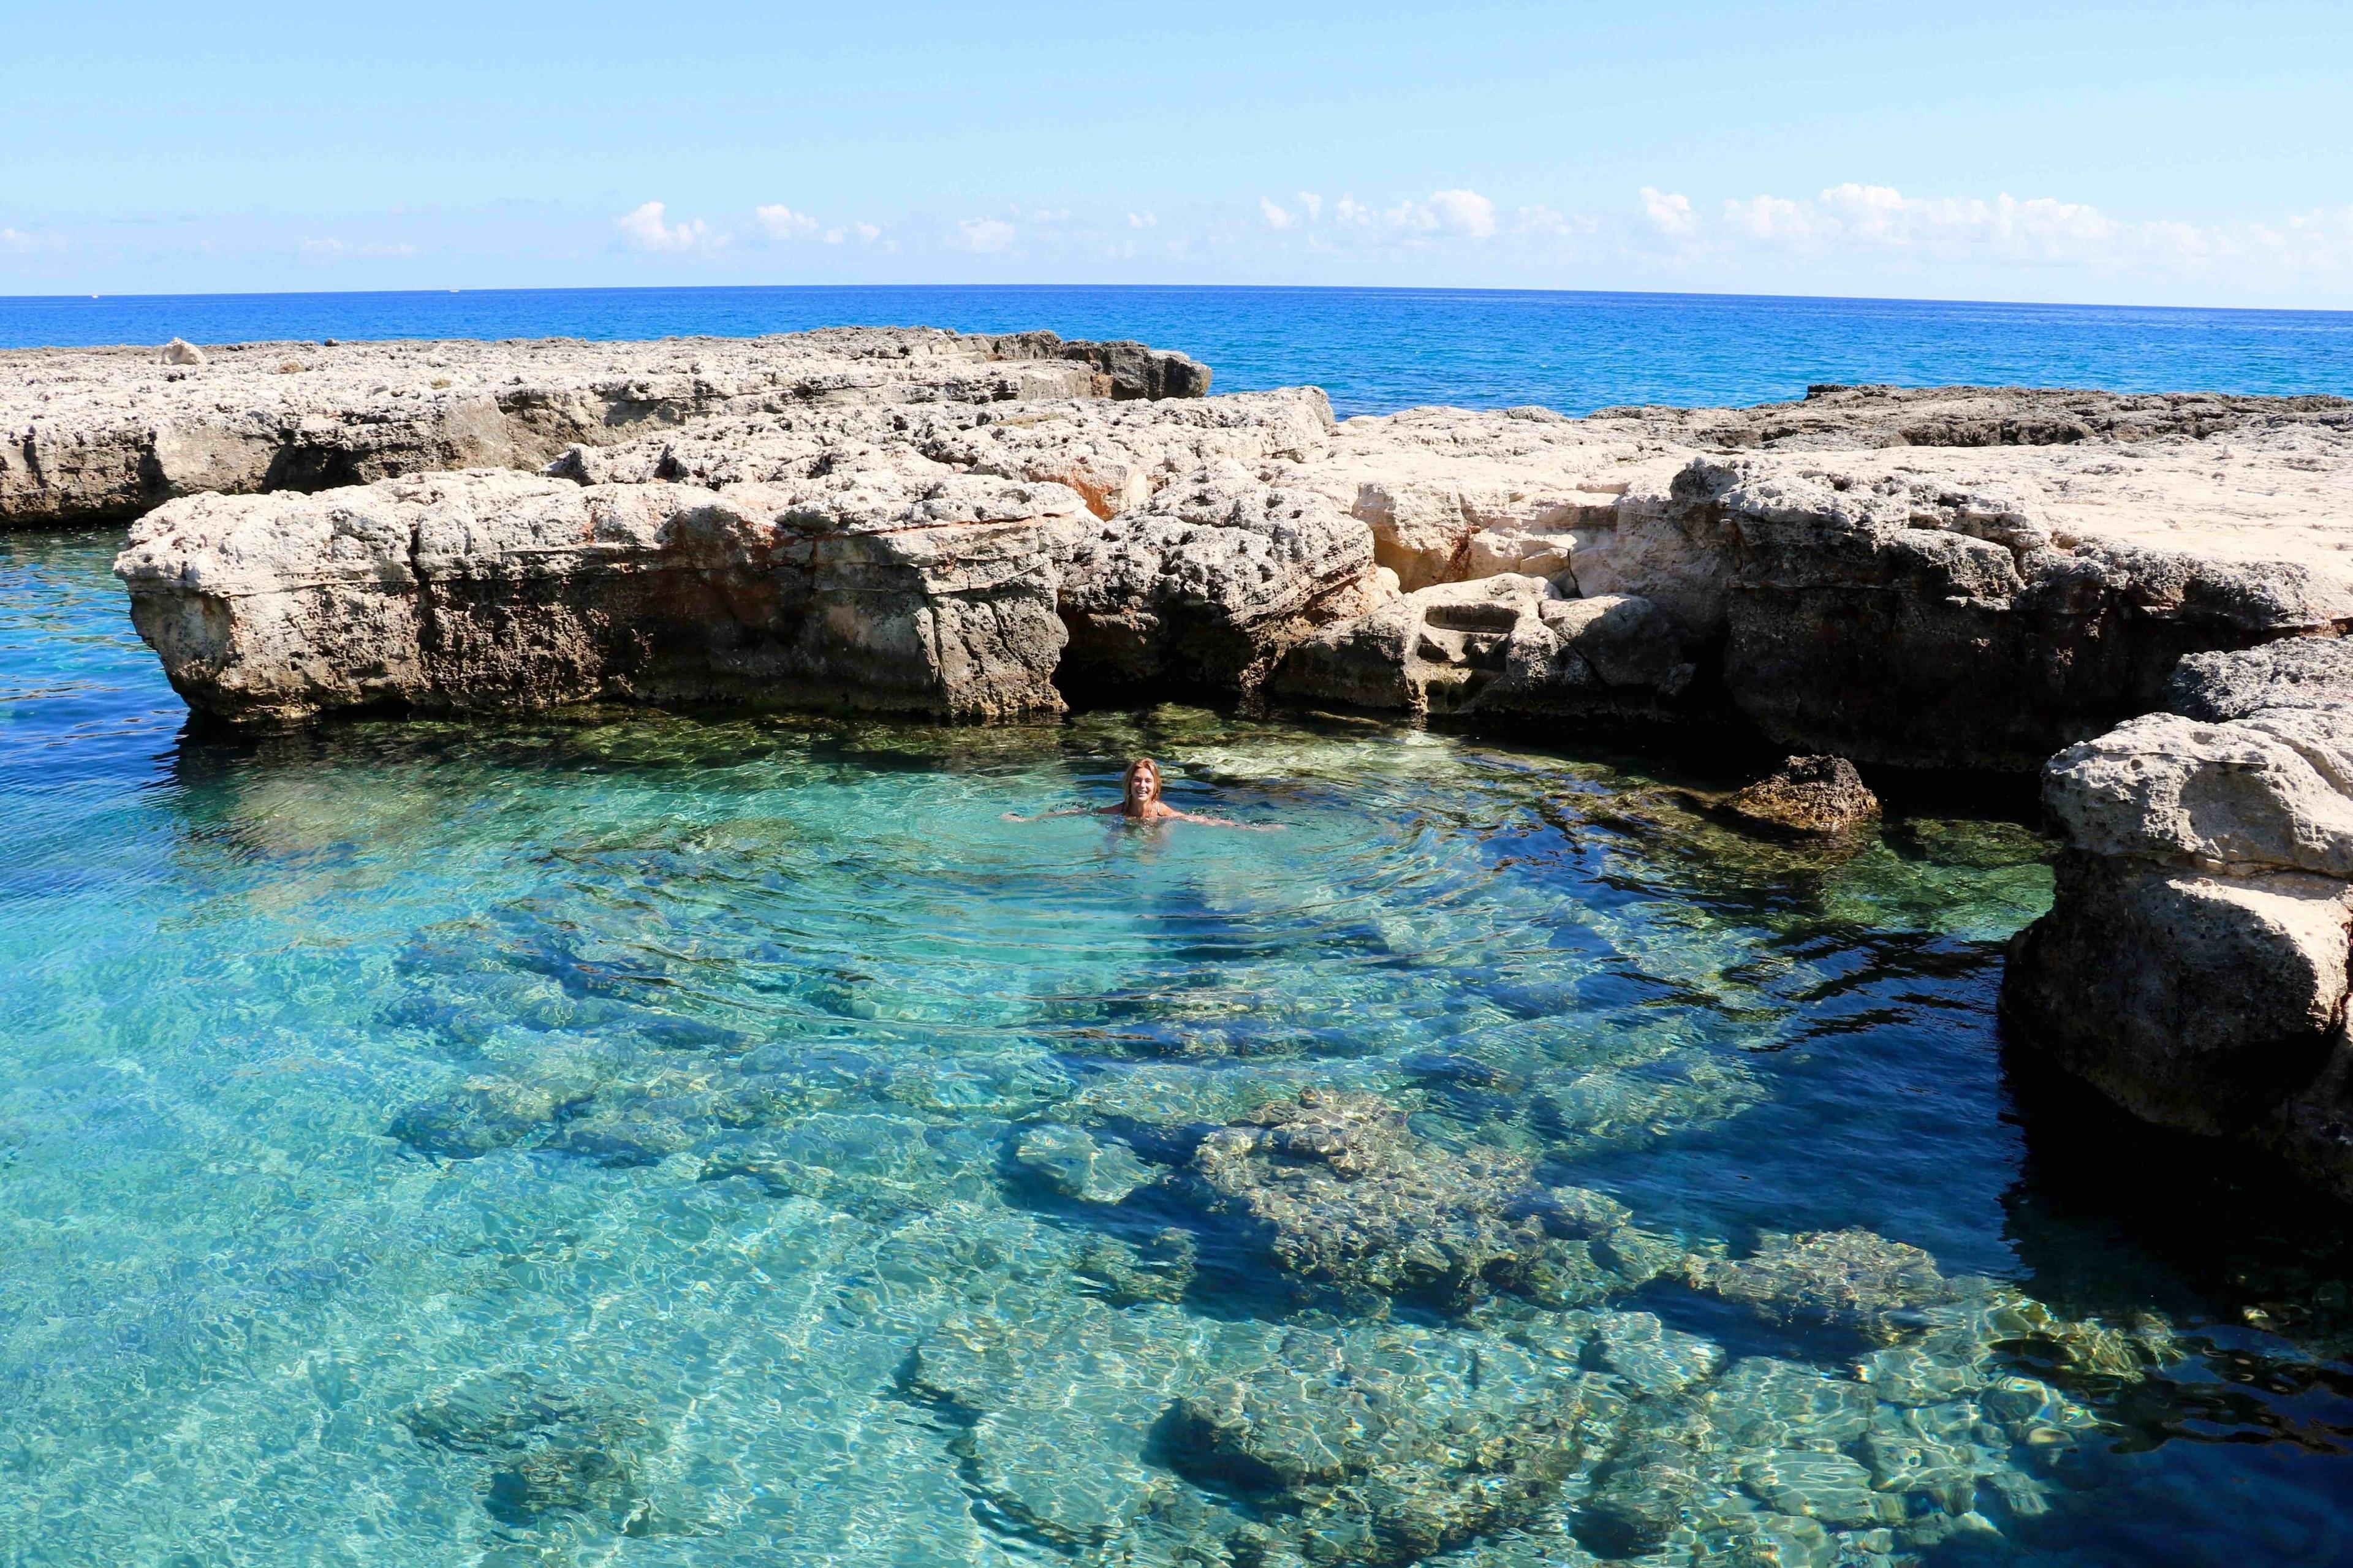 San Foca, Melendugno, Puglia, Italy